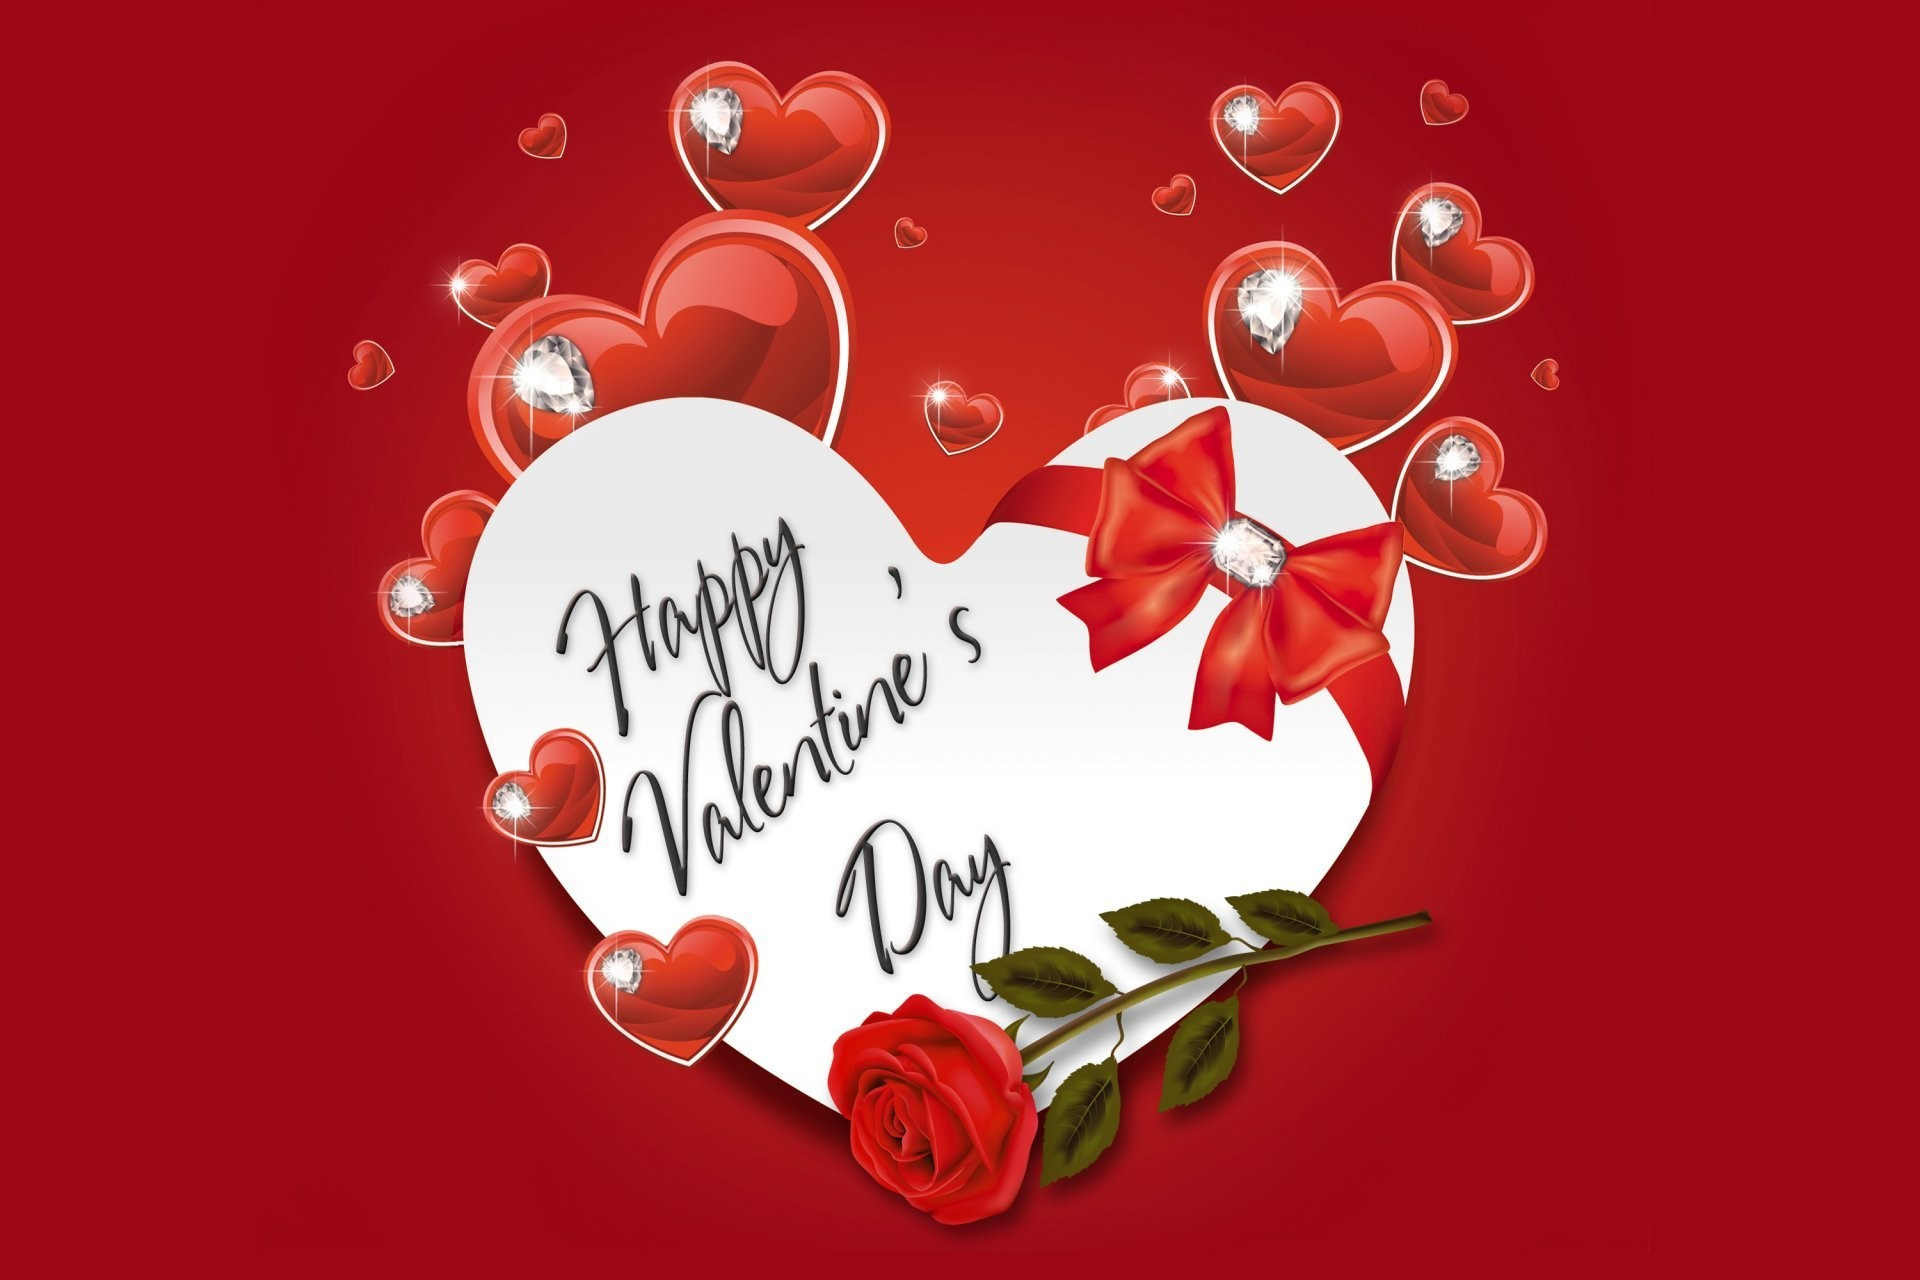 happy valentine's day love heart romantic rose heart heart diamonds bow